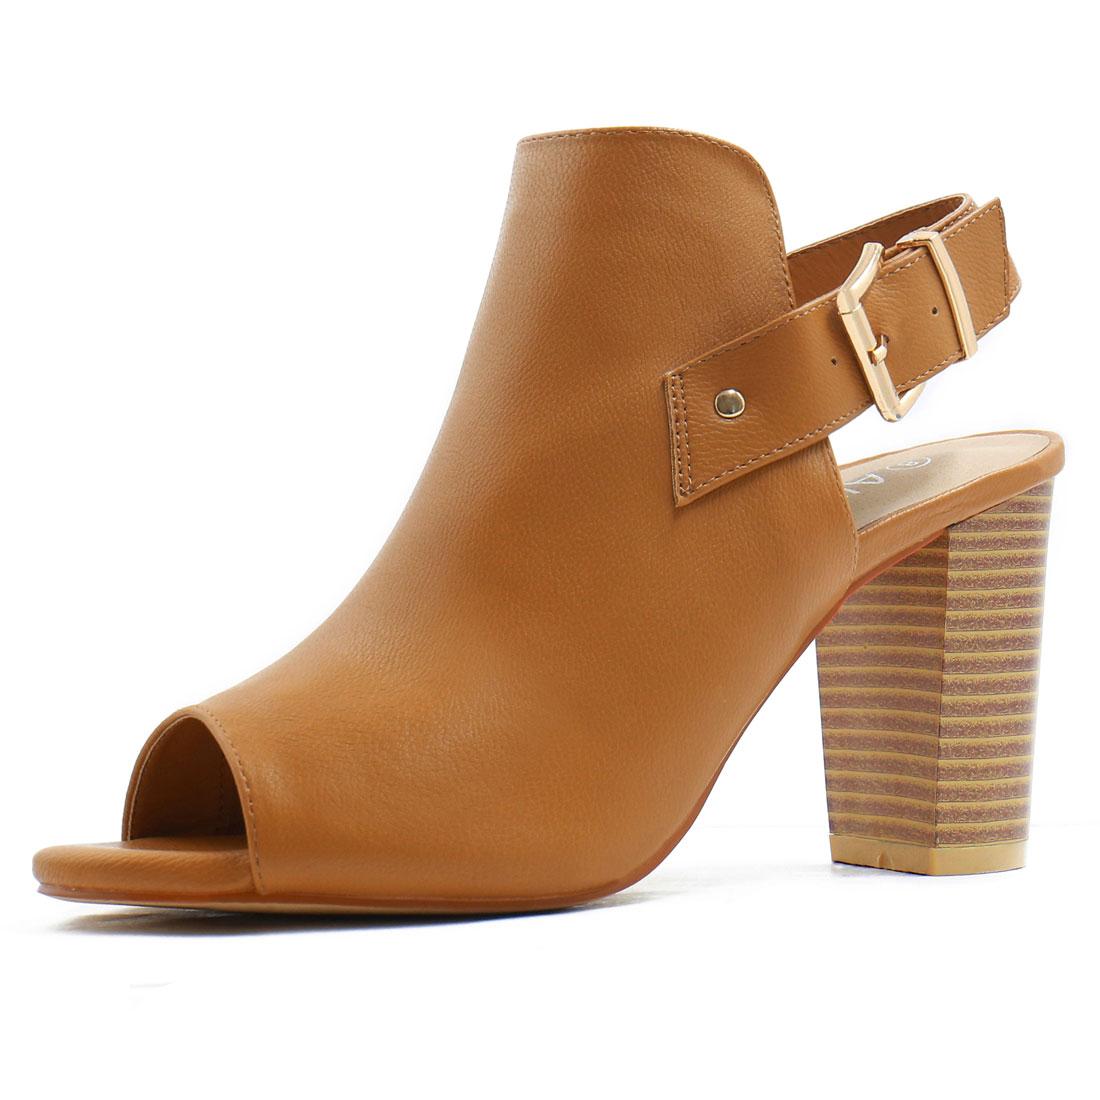 Women Peep Toe Slip On Stacked Heel Slingback Sandals Camel US 8.5